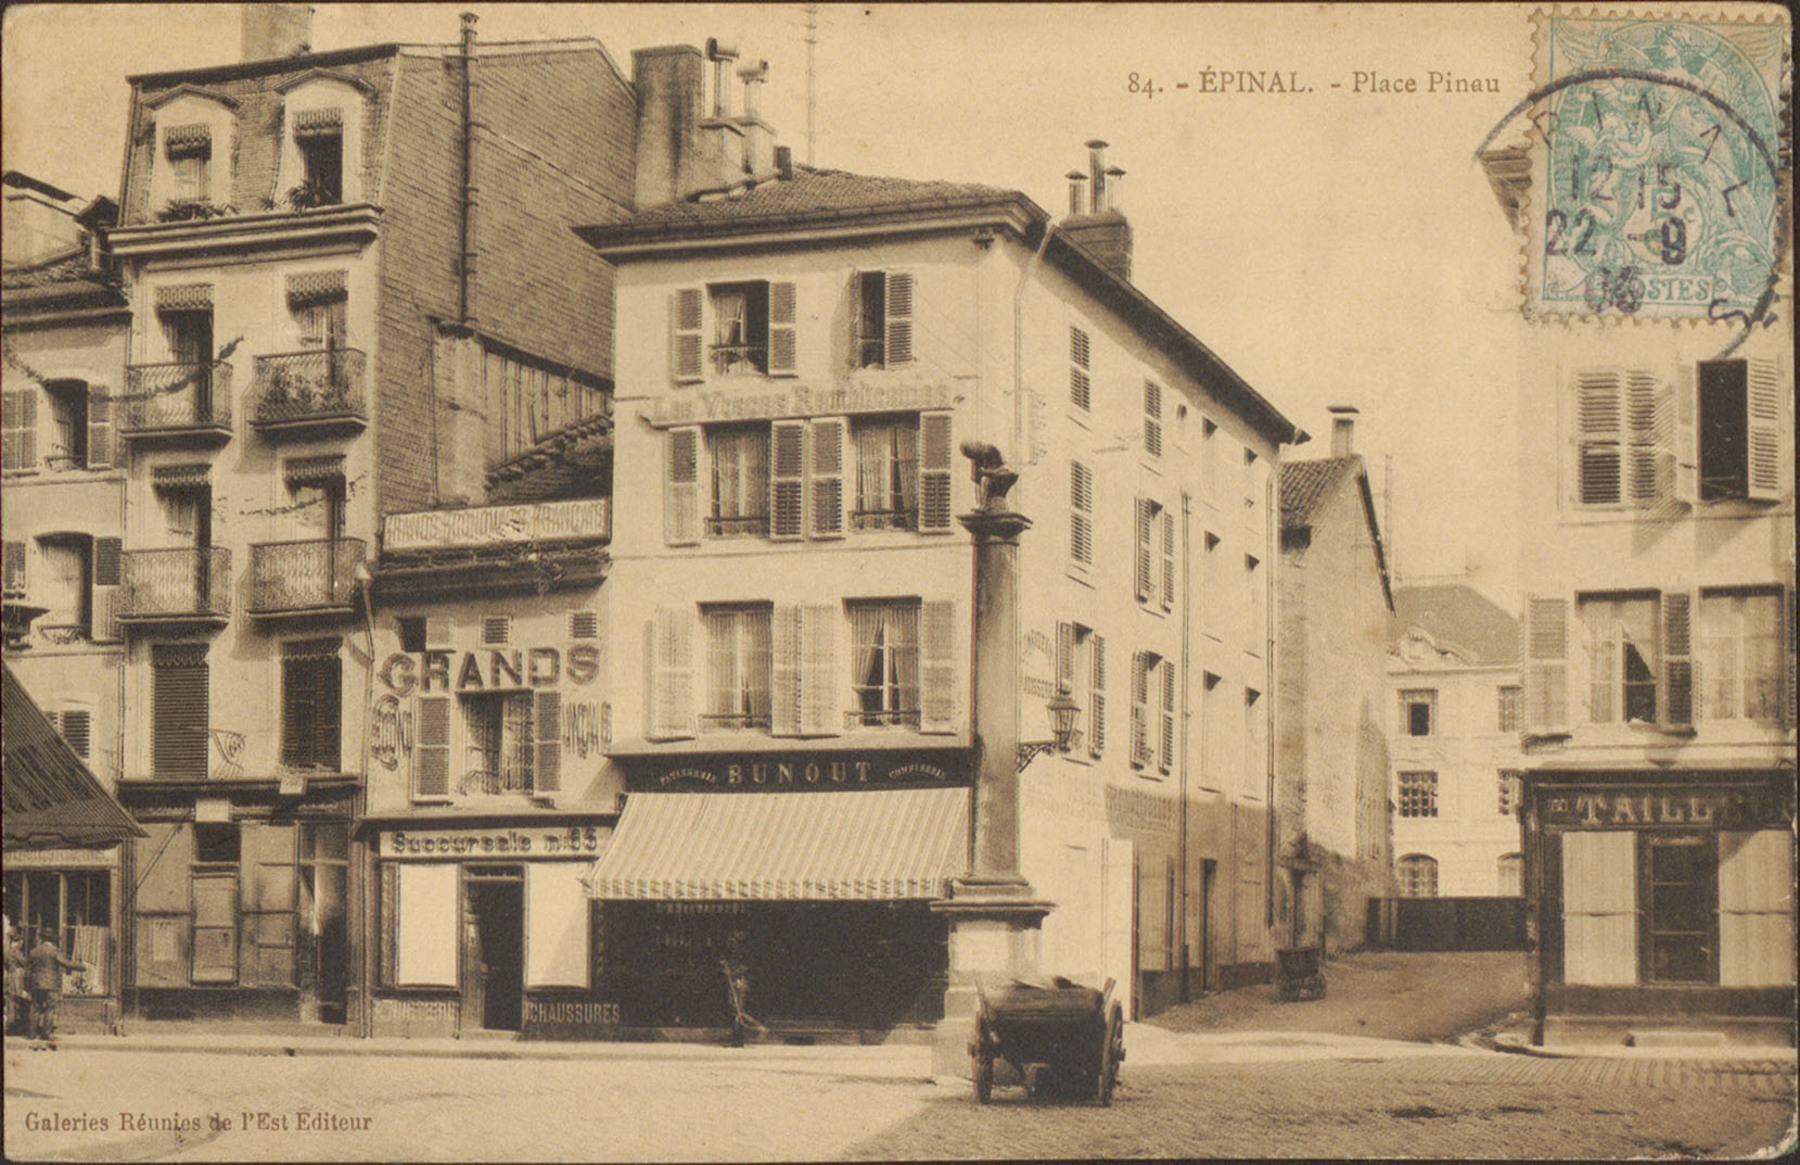 Contenu du Épinal, Place Pinau